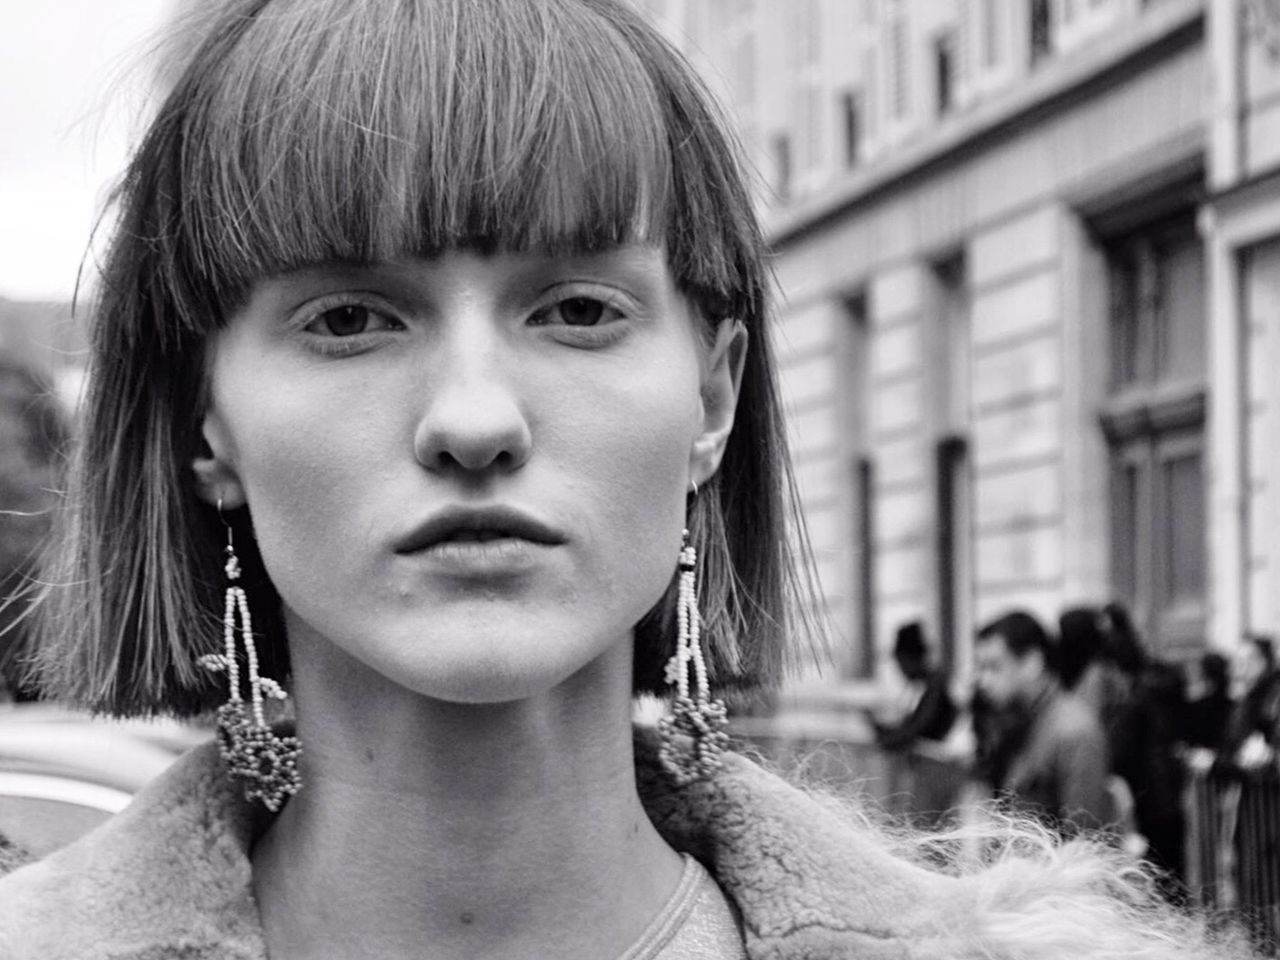 Woman Portrait Portrait Of A Woman Model Bnw Fashion Fashionweek Mode Looking At Camera Young Women Close-up Headshot Face People